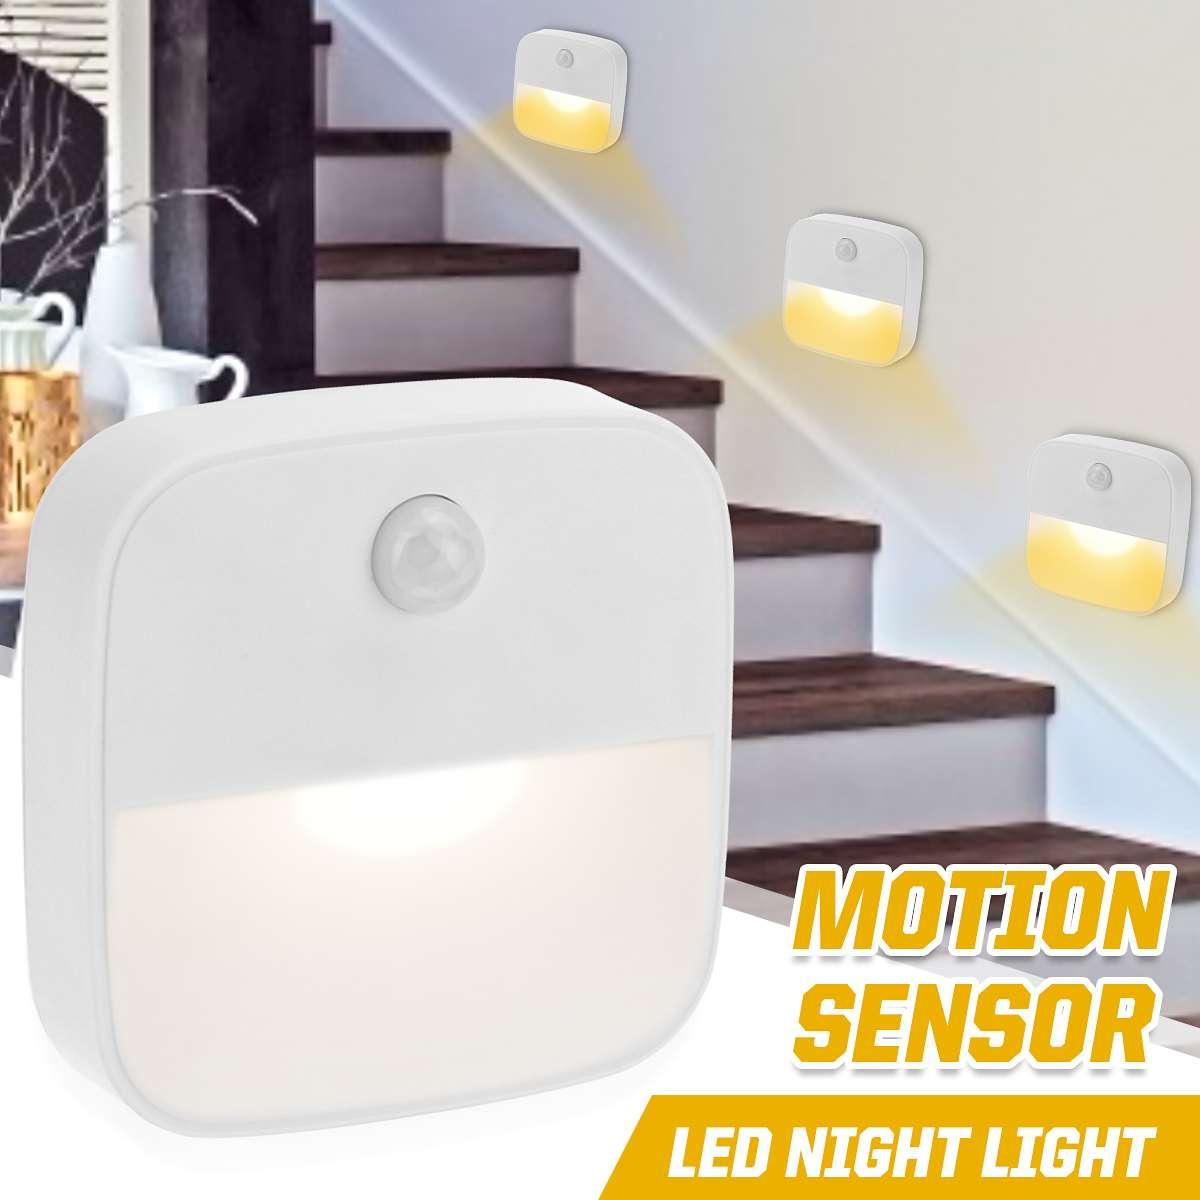 110-220V Night Light Motion Sensor PIR Human Infrared Activated Movement Detect Wall Emergency Lamp Hallway Bedroom